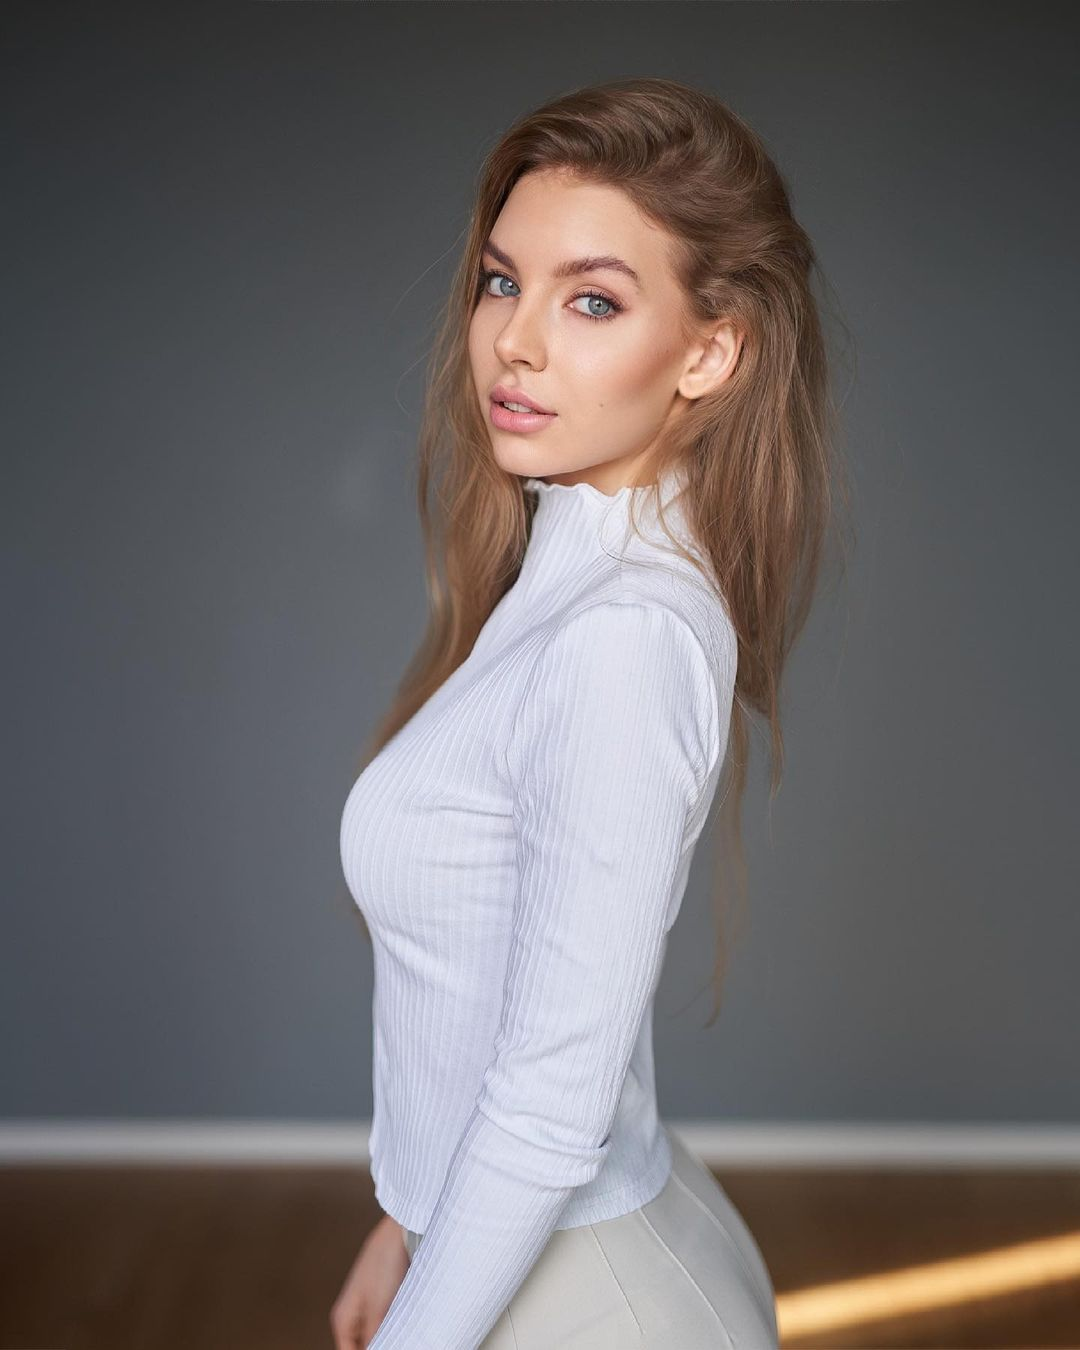 Elizaweta-Amalia-Wallpapers-Insta-Fit-Bio-2